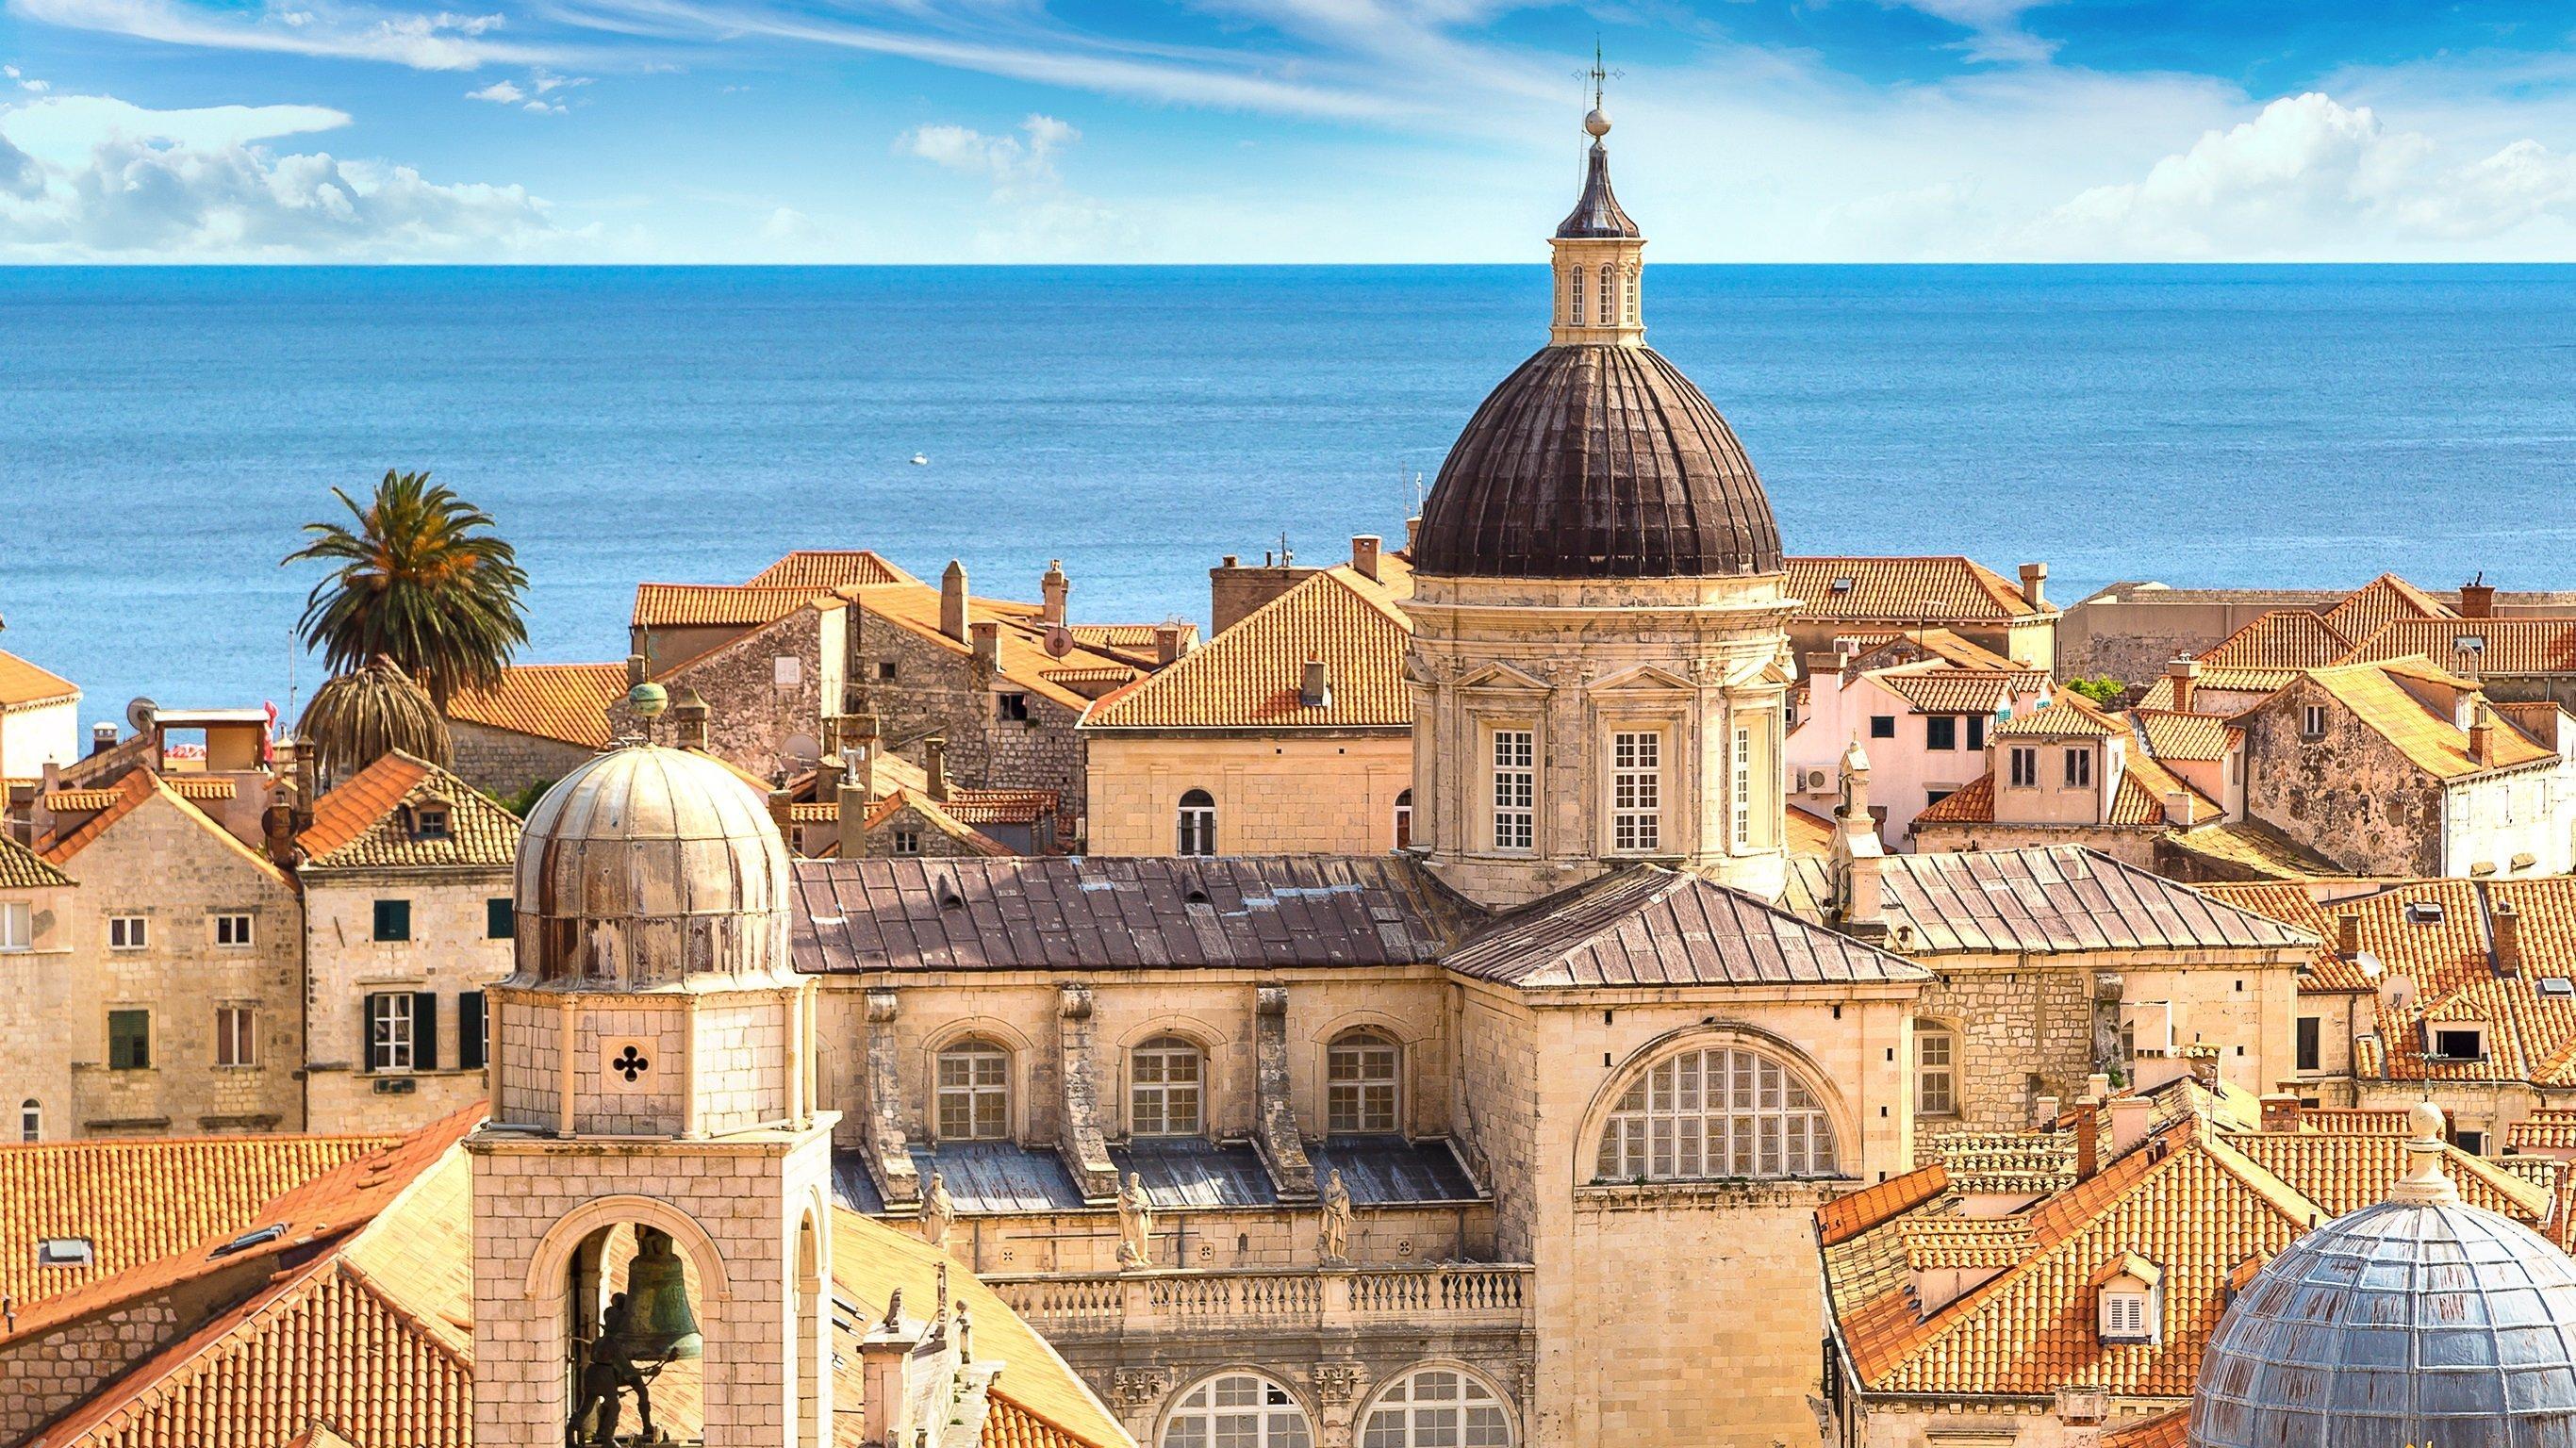 5-Day Explore Dubrovnik & Surrounds - Croatia Itinerary